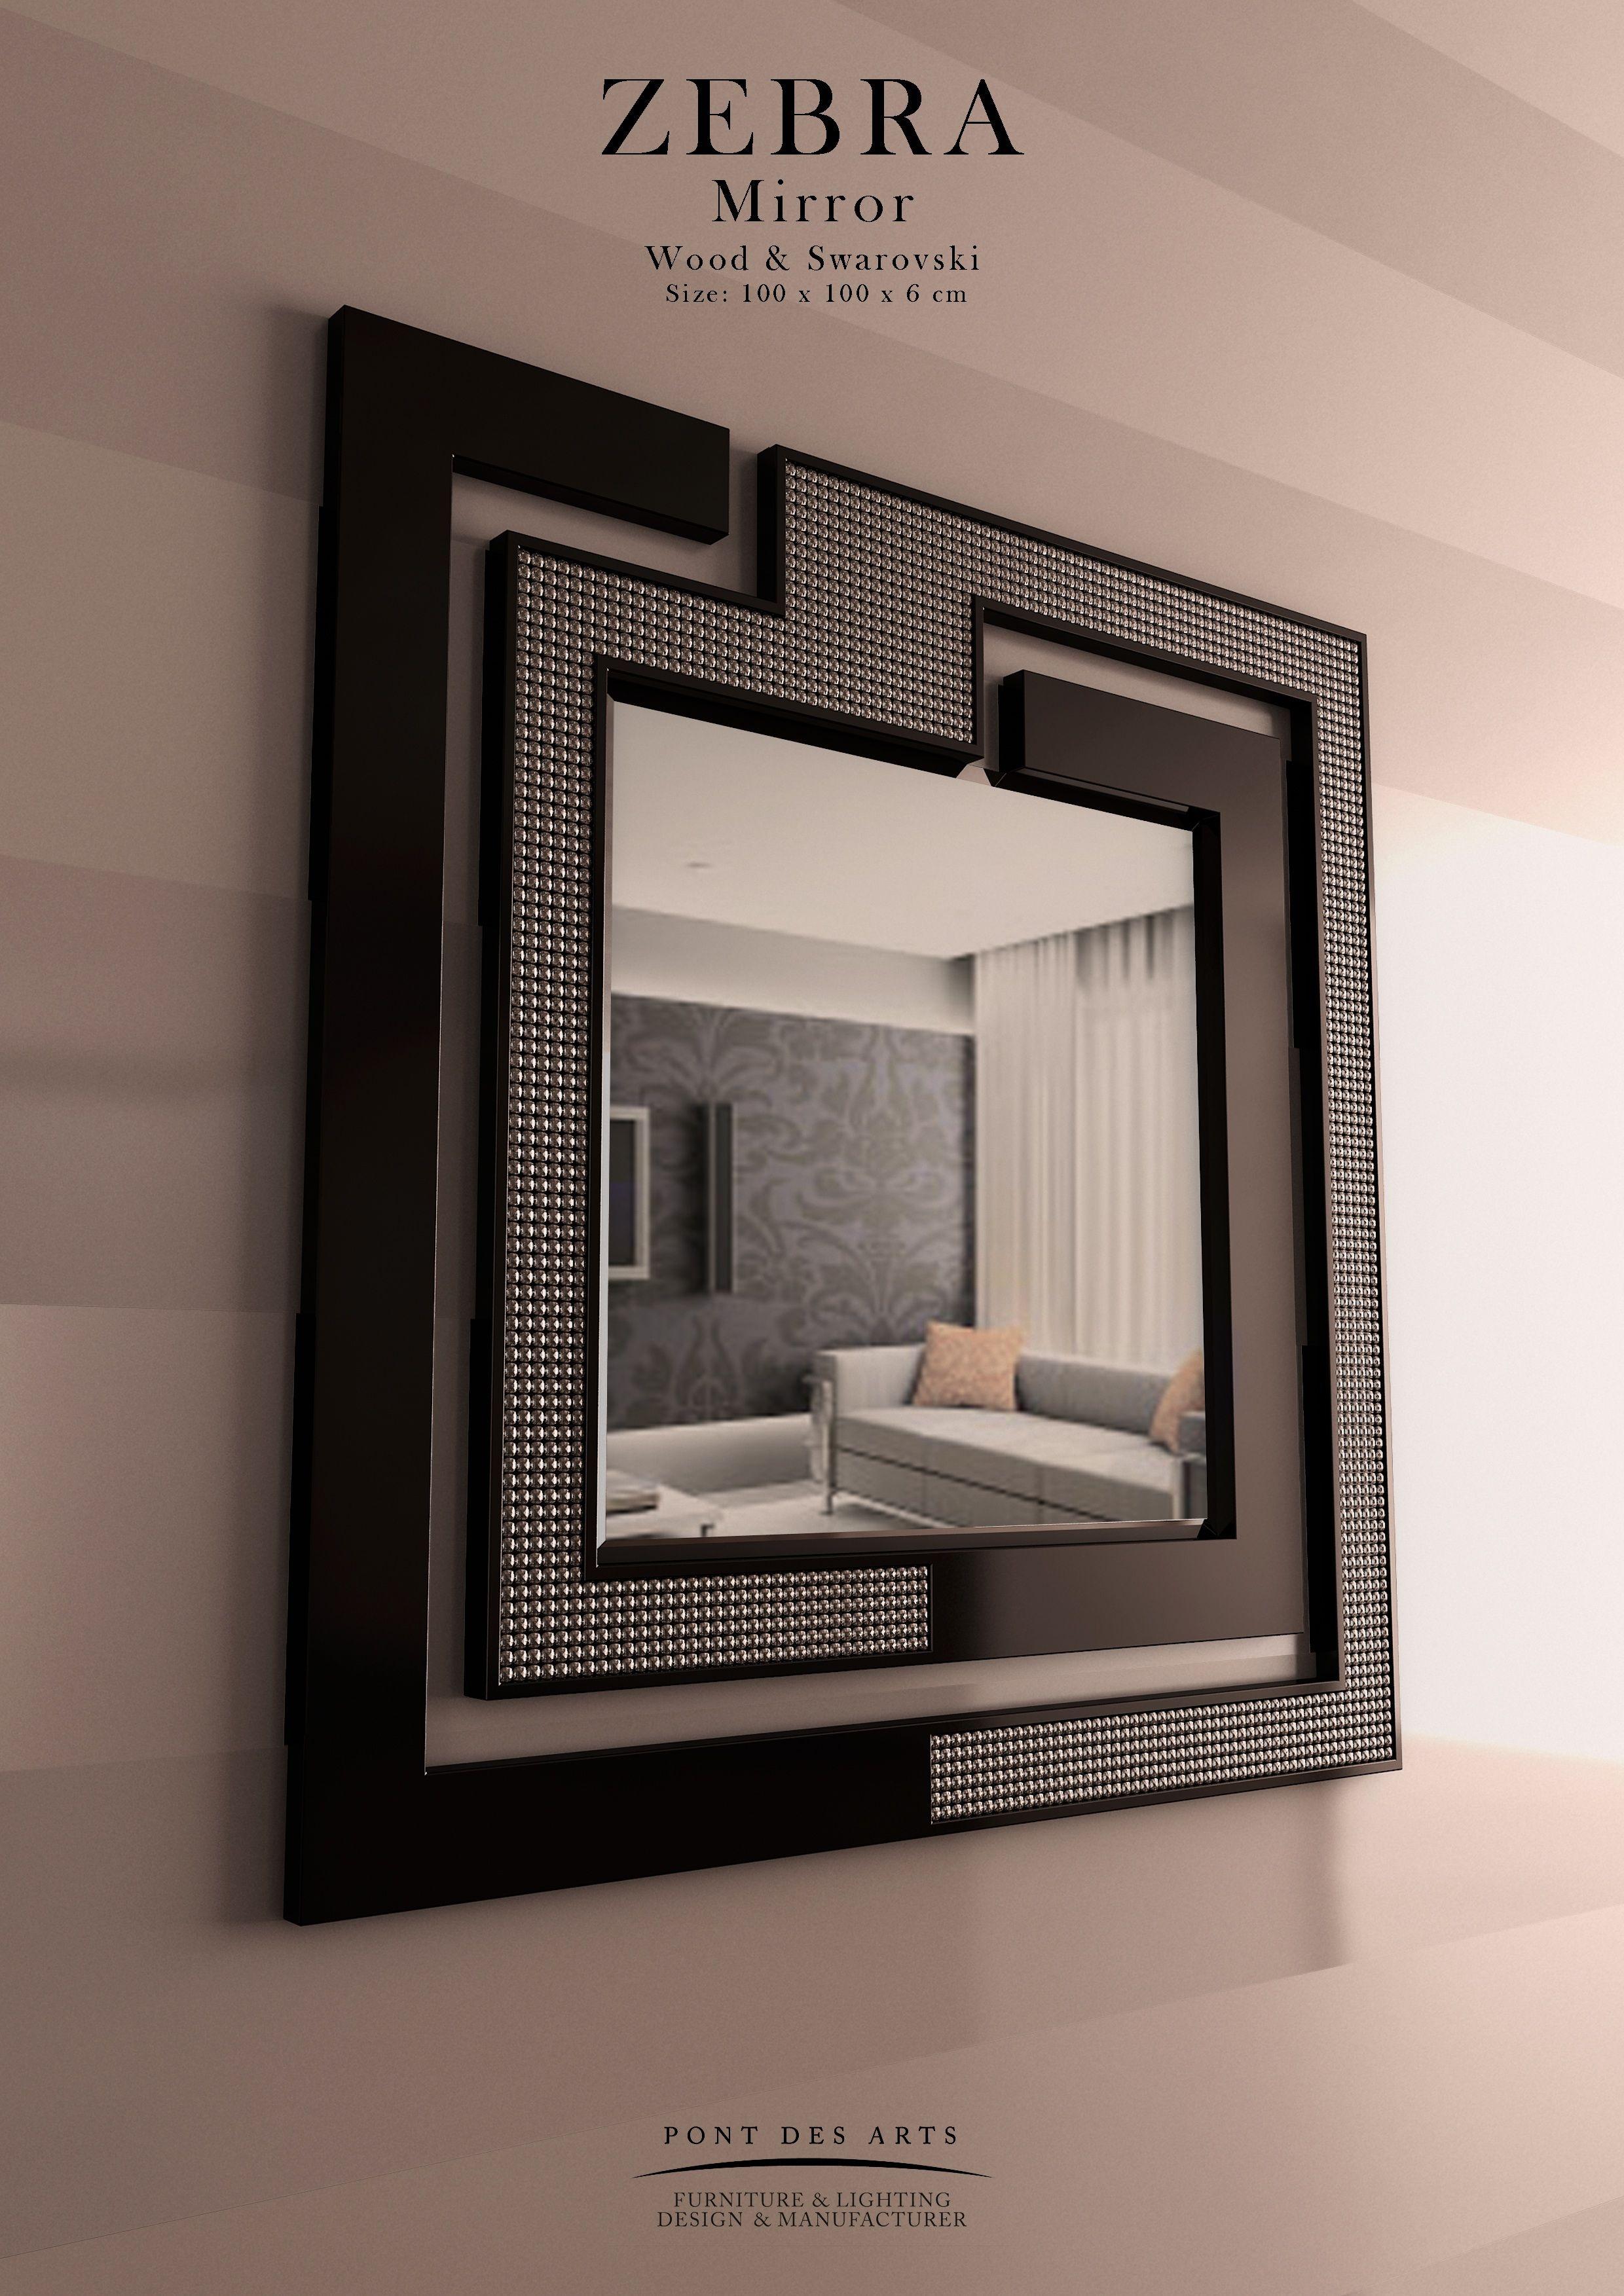 Zebra mirror pont des arts designer monzer hammoud for E mobilia paris